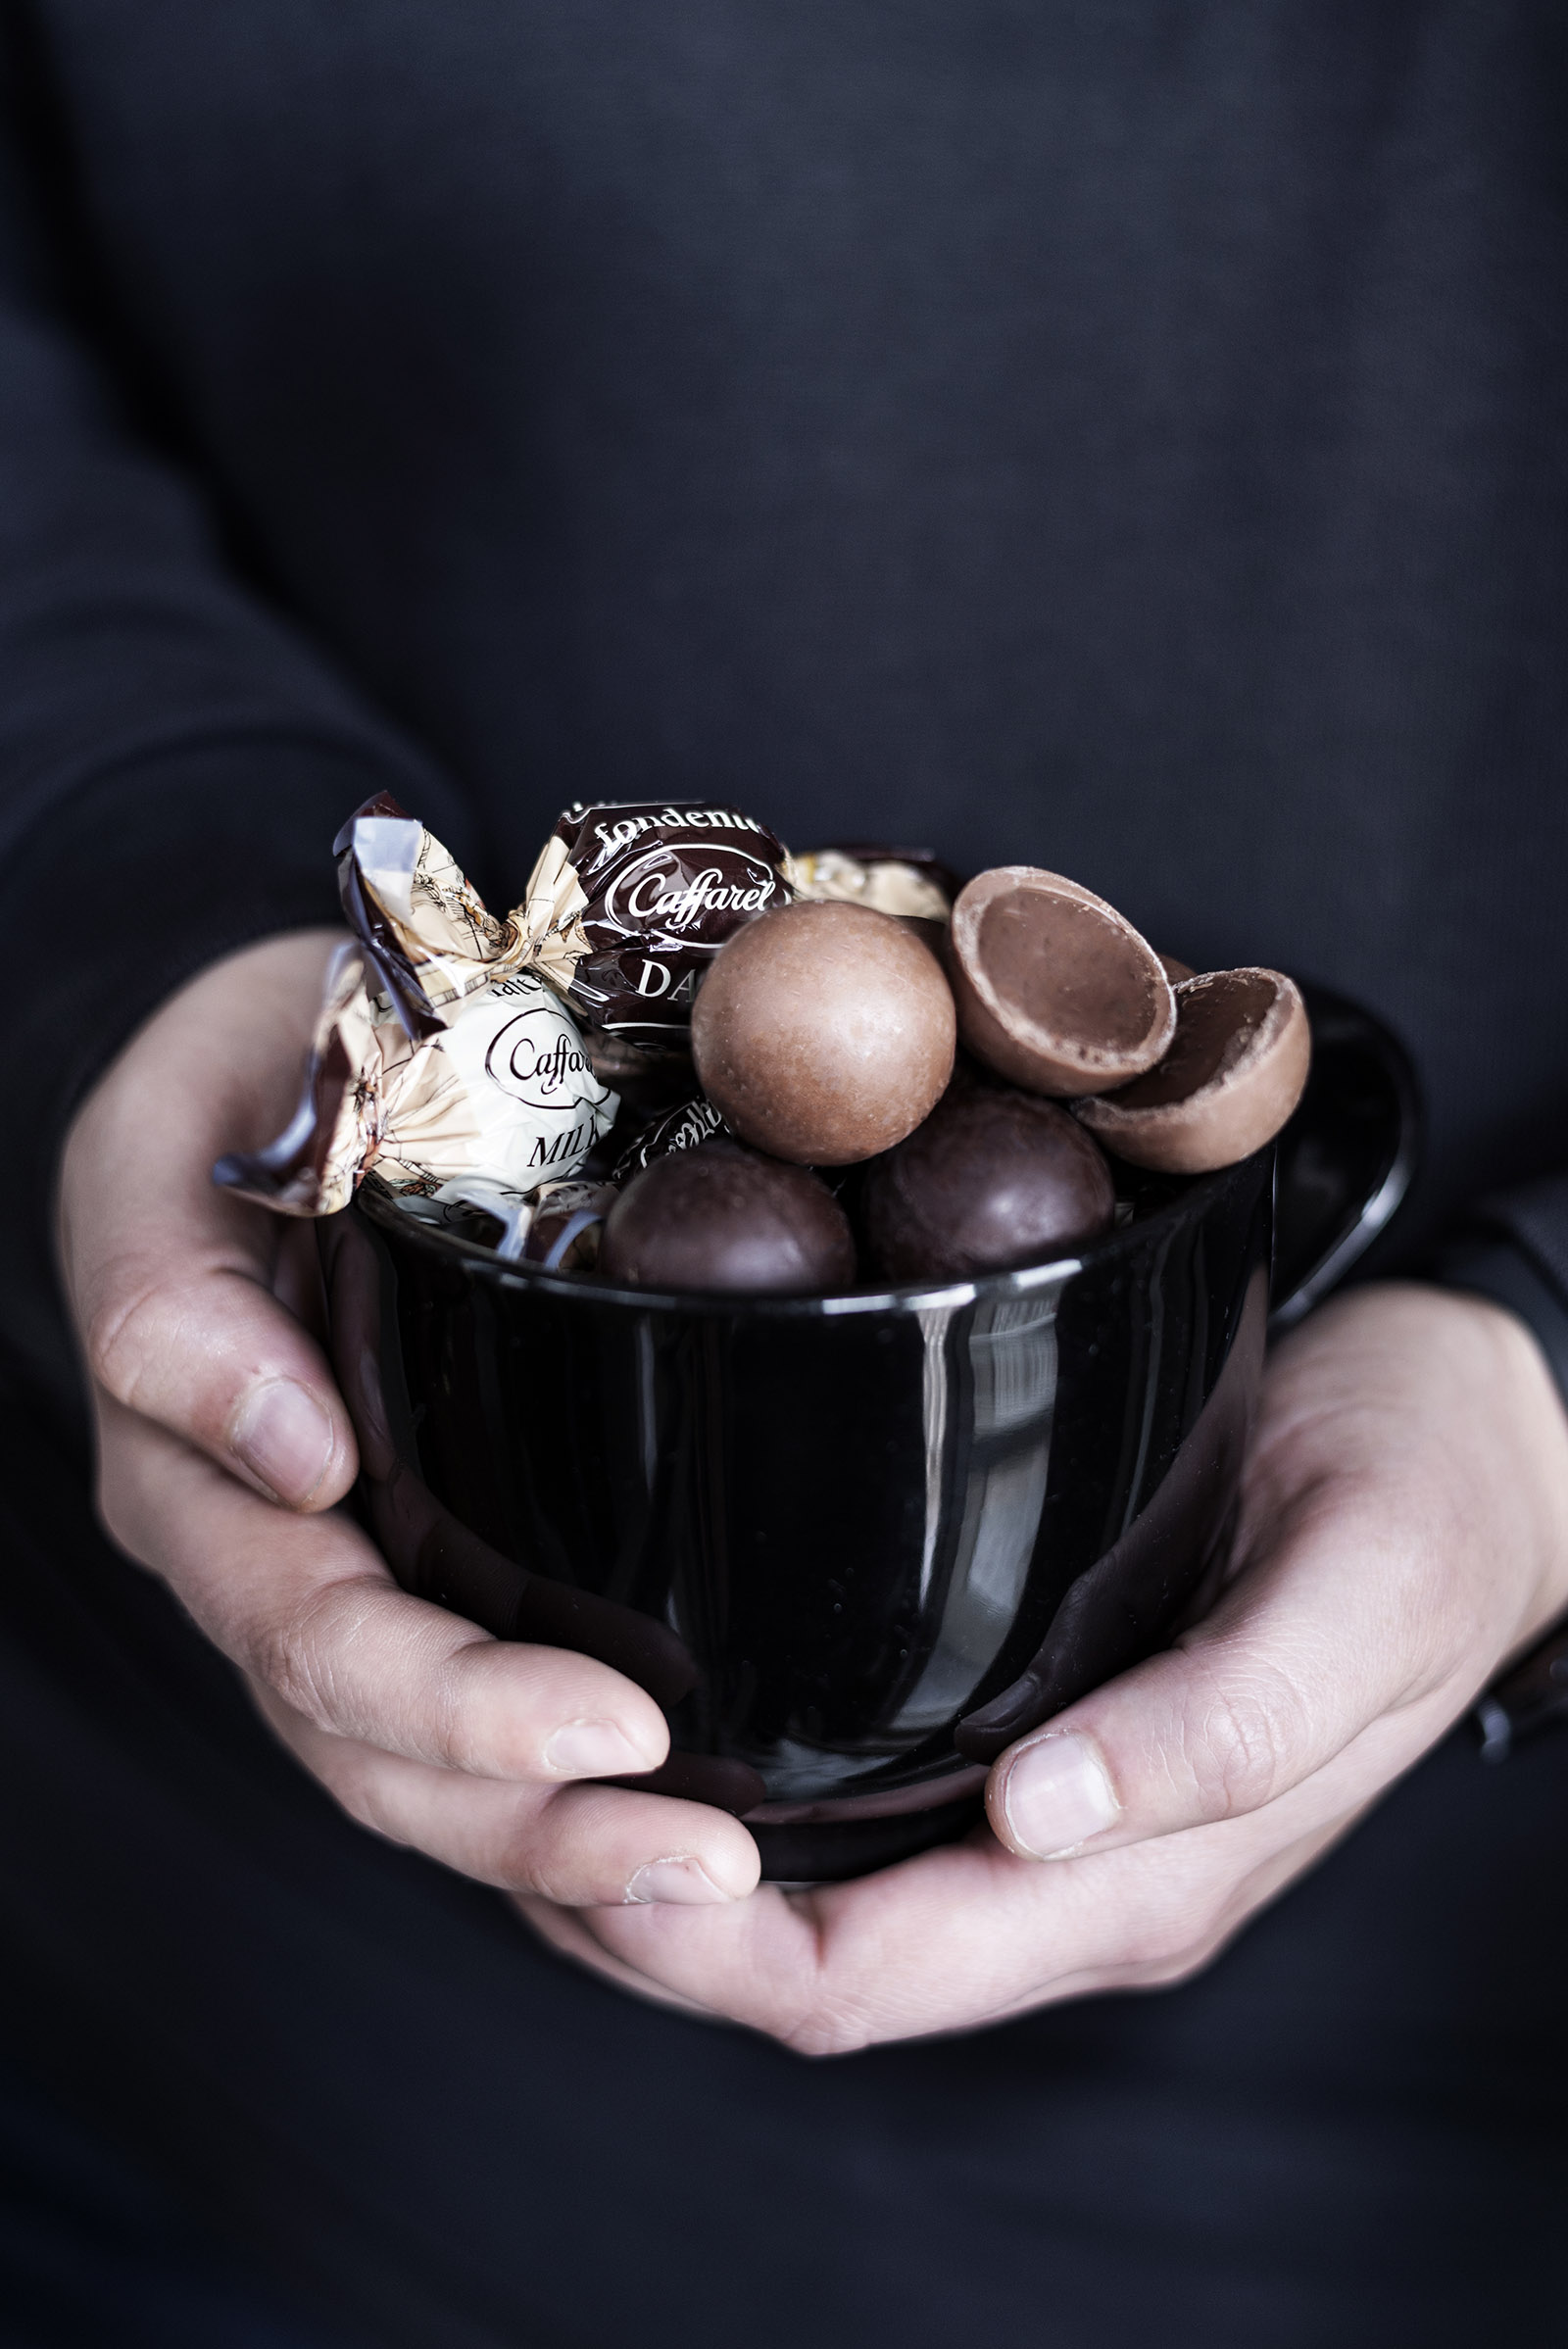 cioccolatini Caffarel